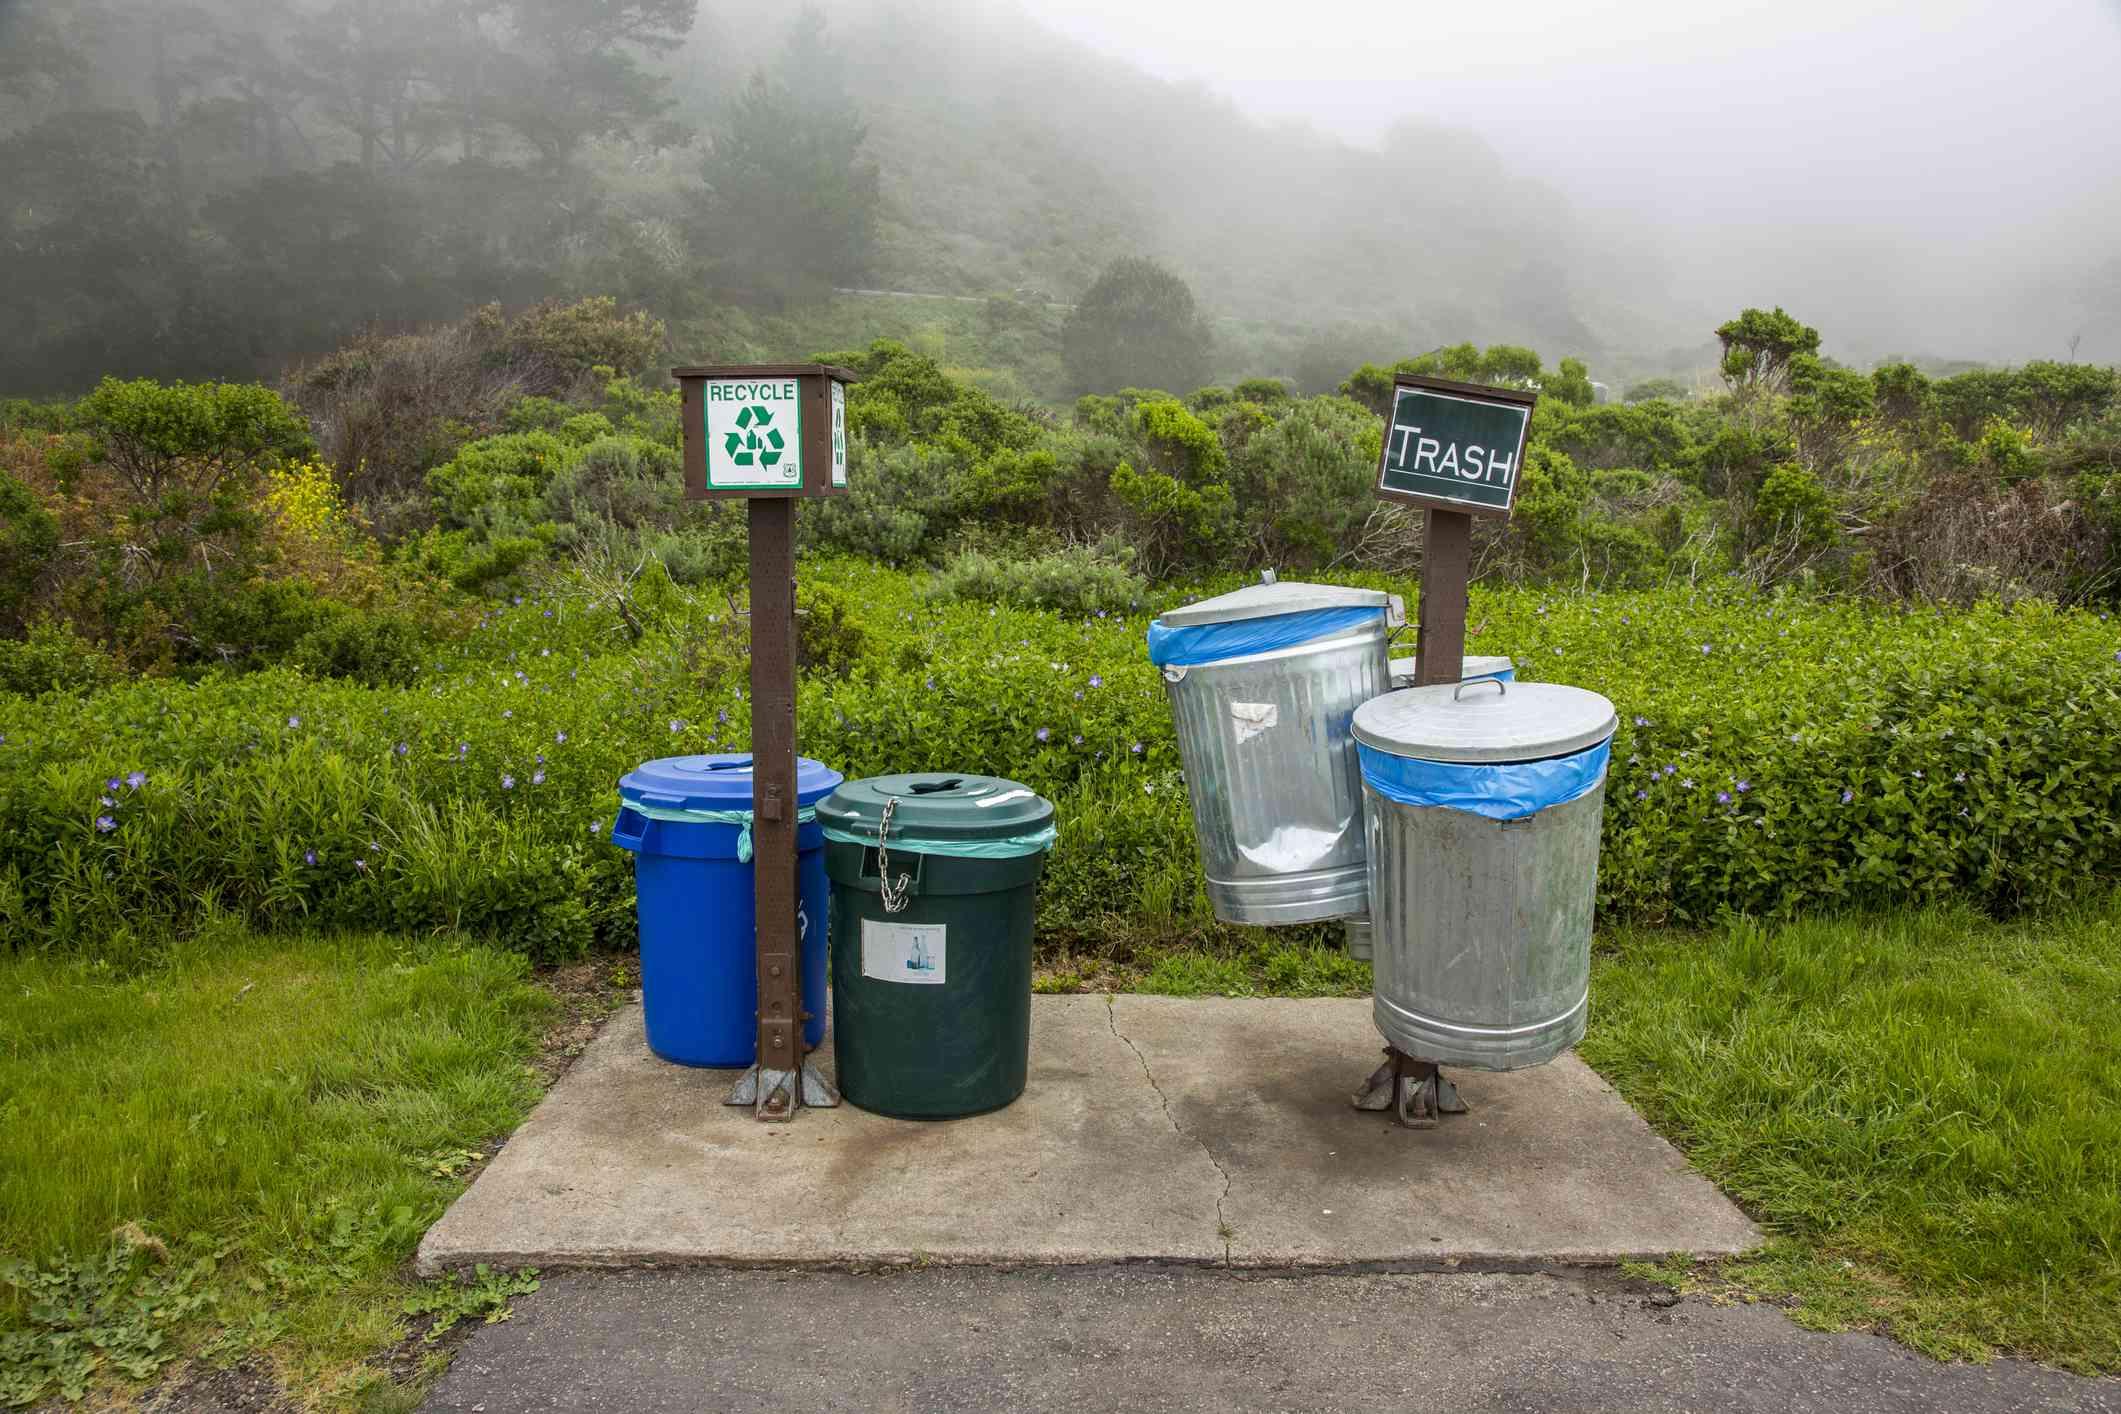 Designated trash facilities in a park